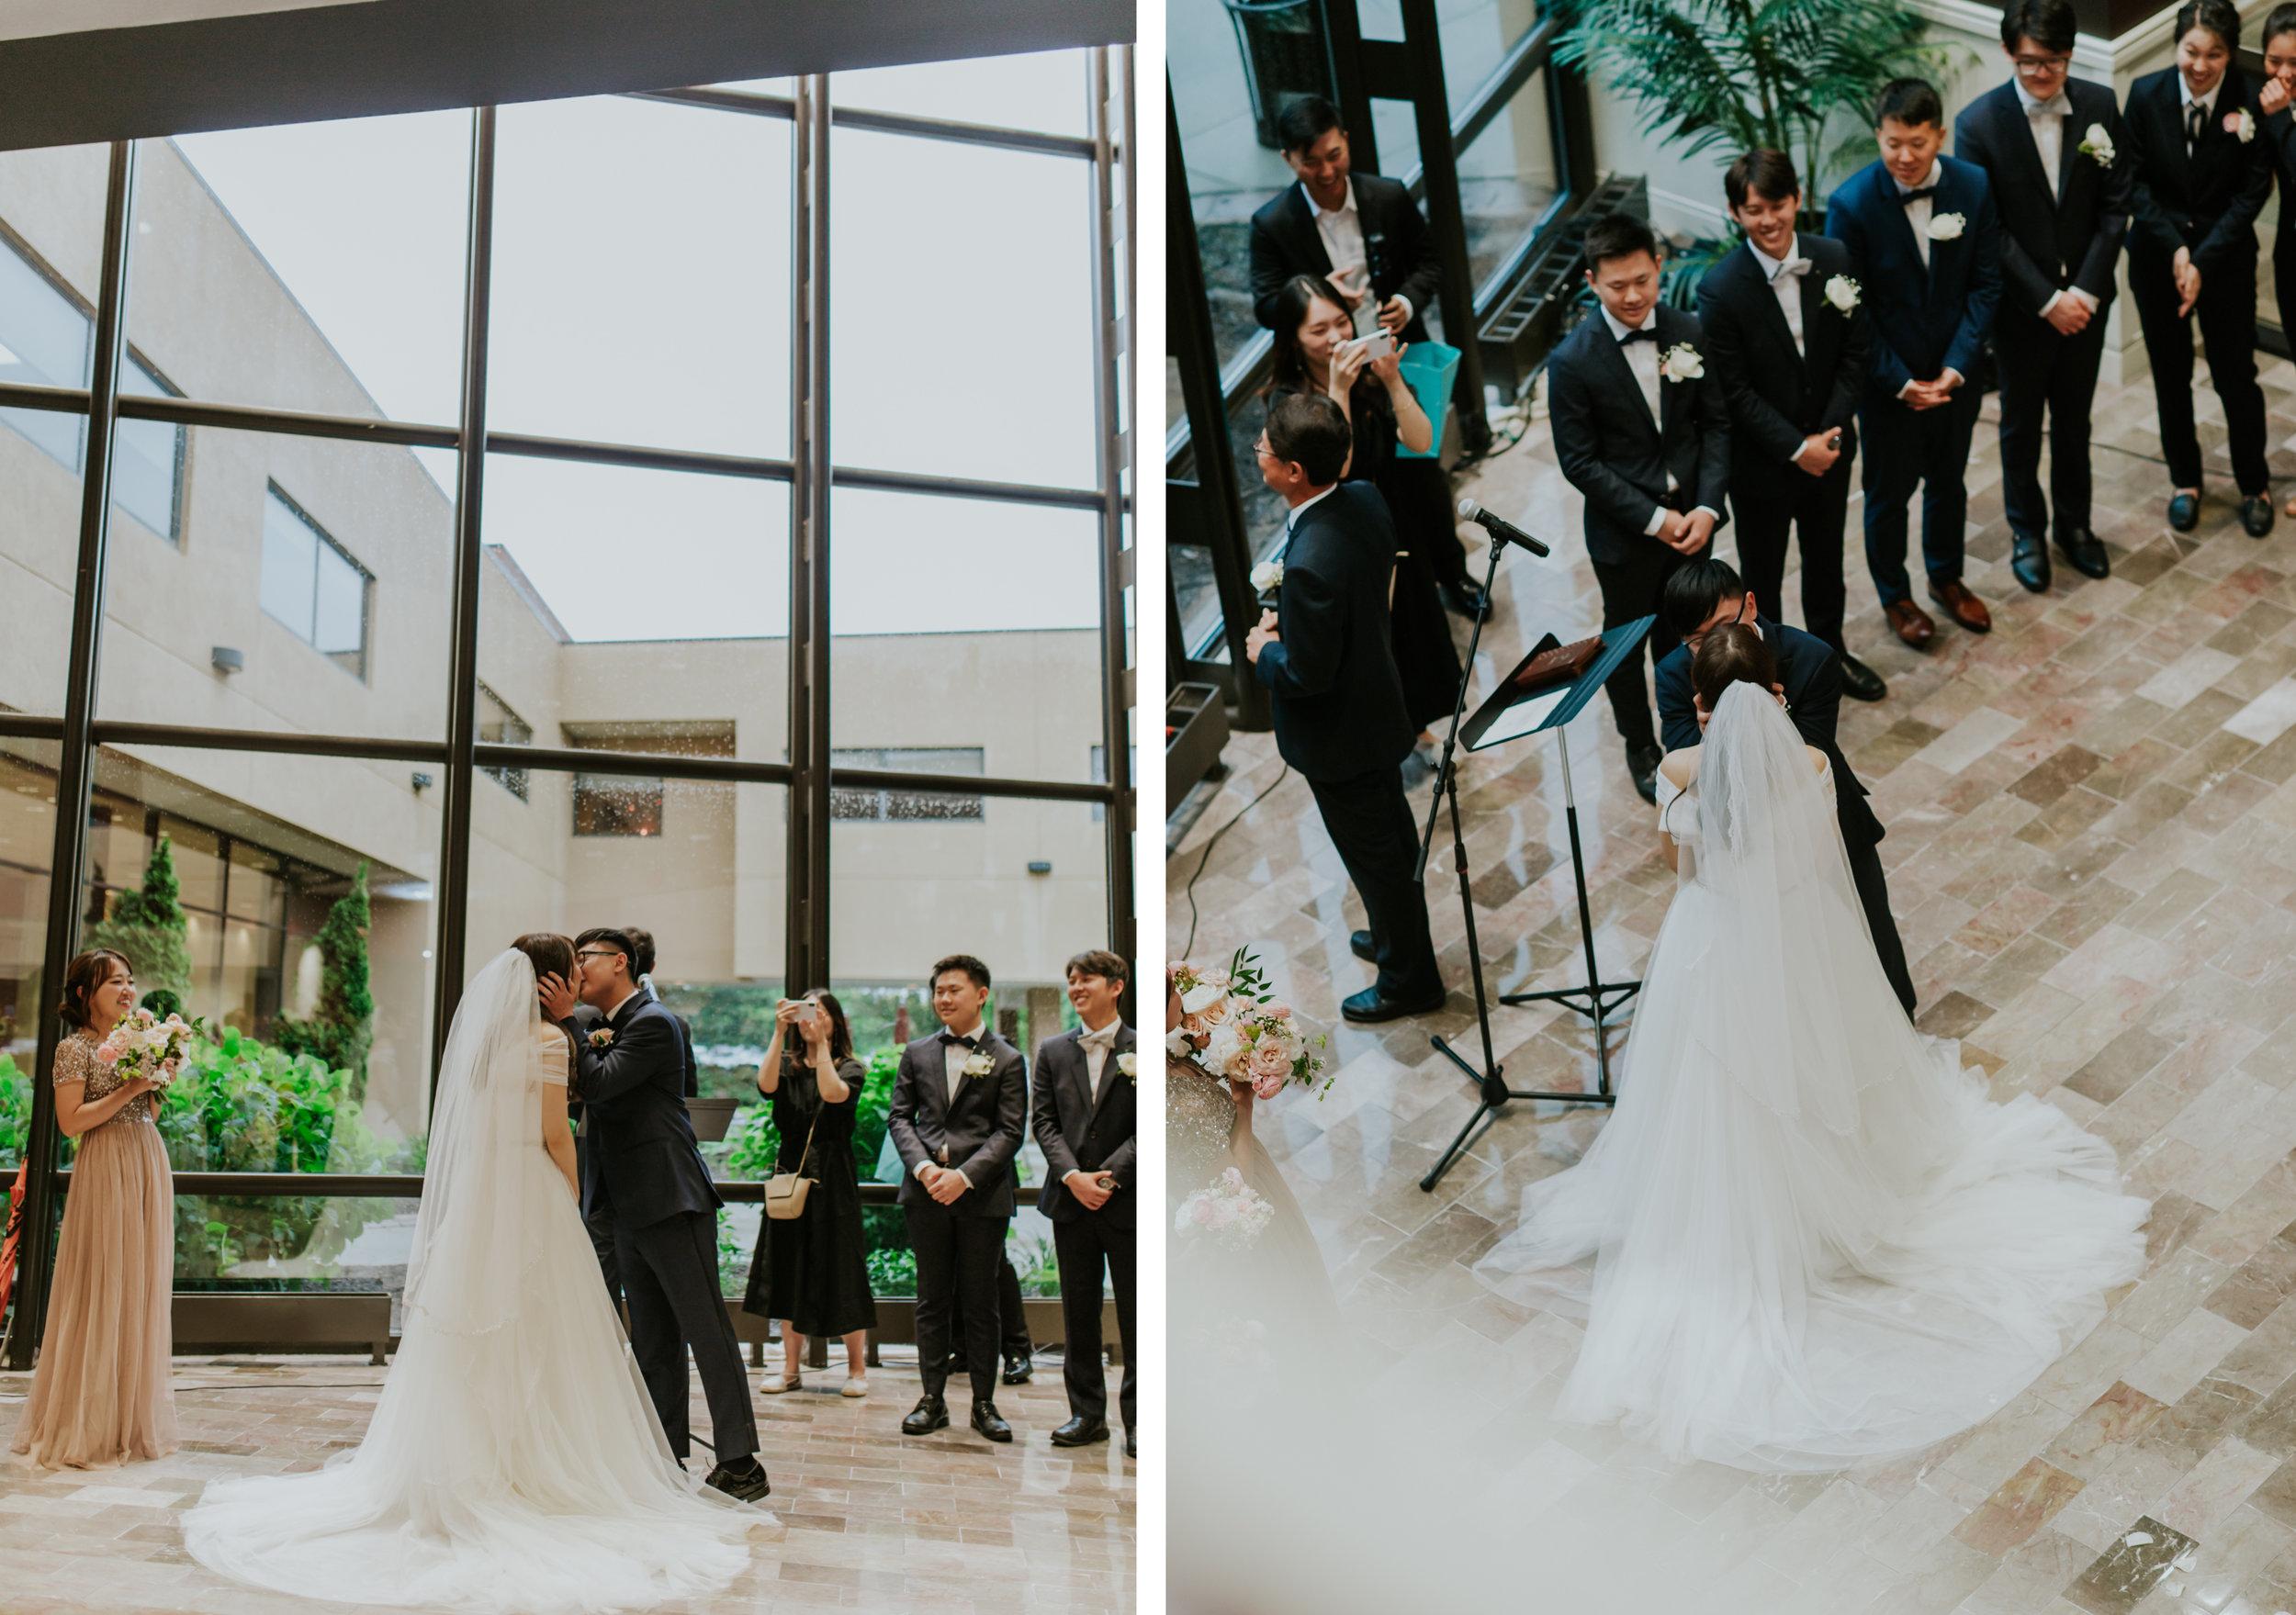 LGP-ann-arbor-eagle-crest-wedding-032.jpg